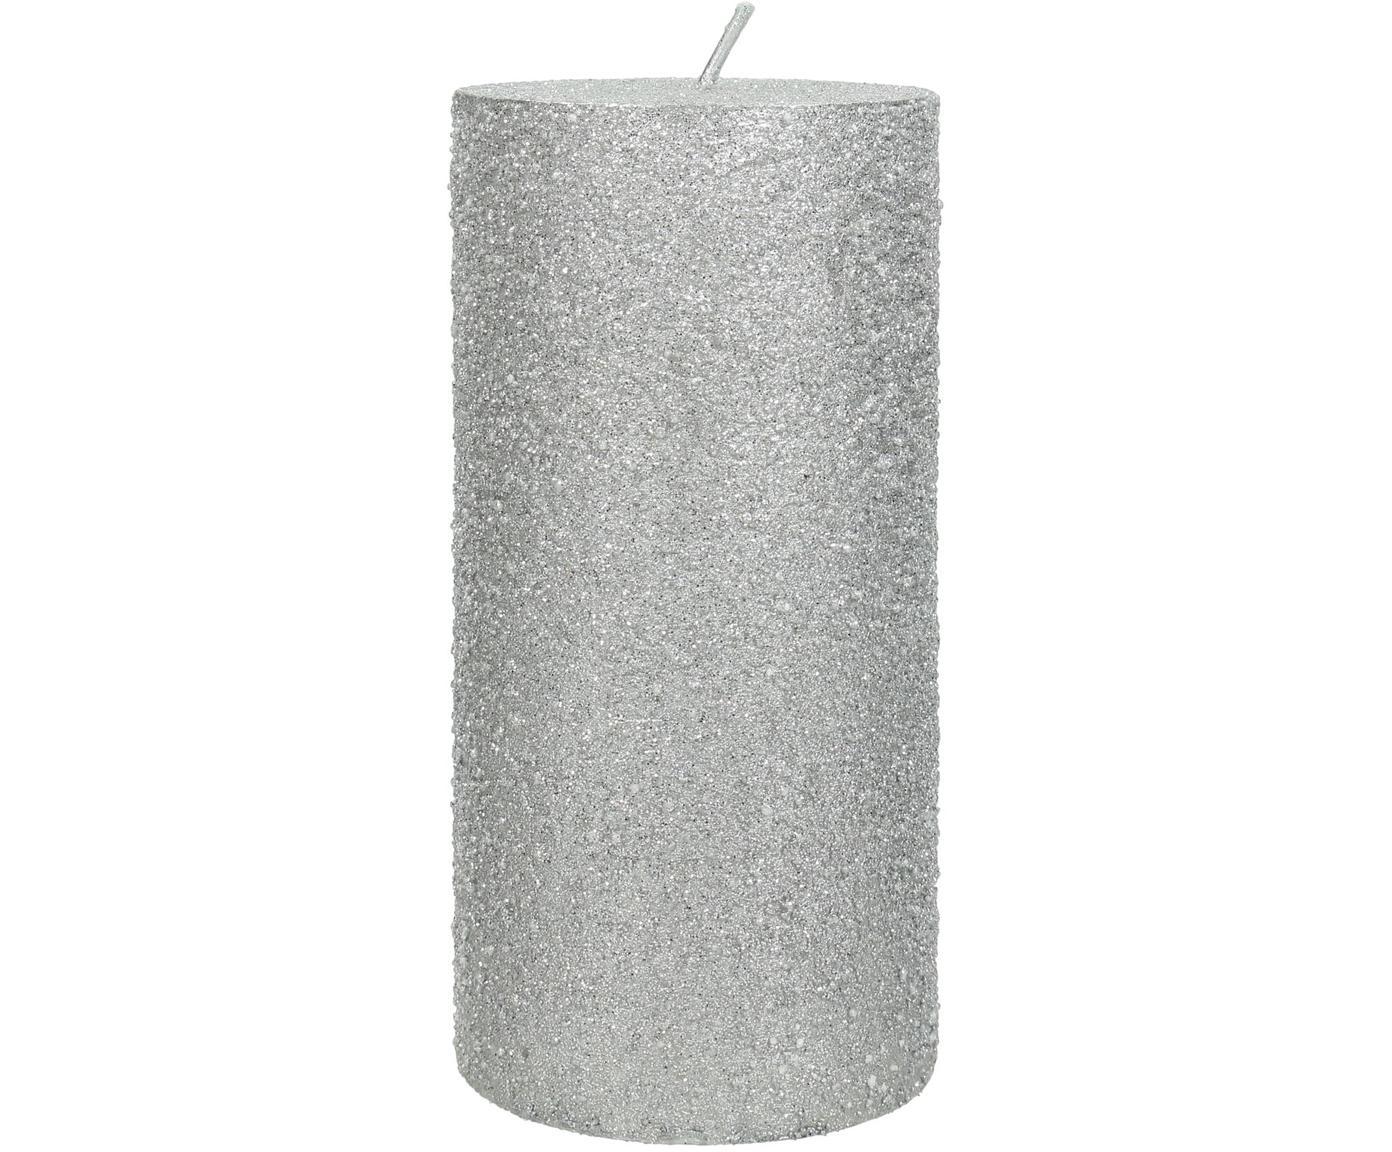 Stumpenkerze Flair, Wachs, Silberfarben, Ø 7 x H 15 cm